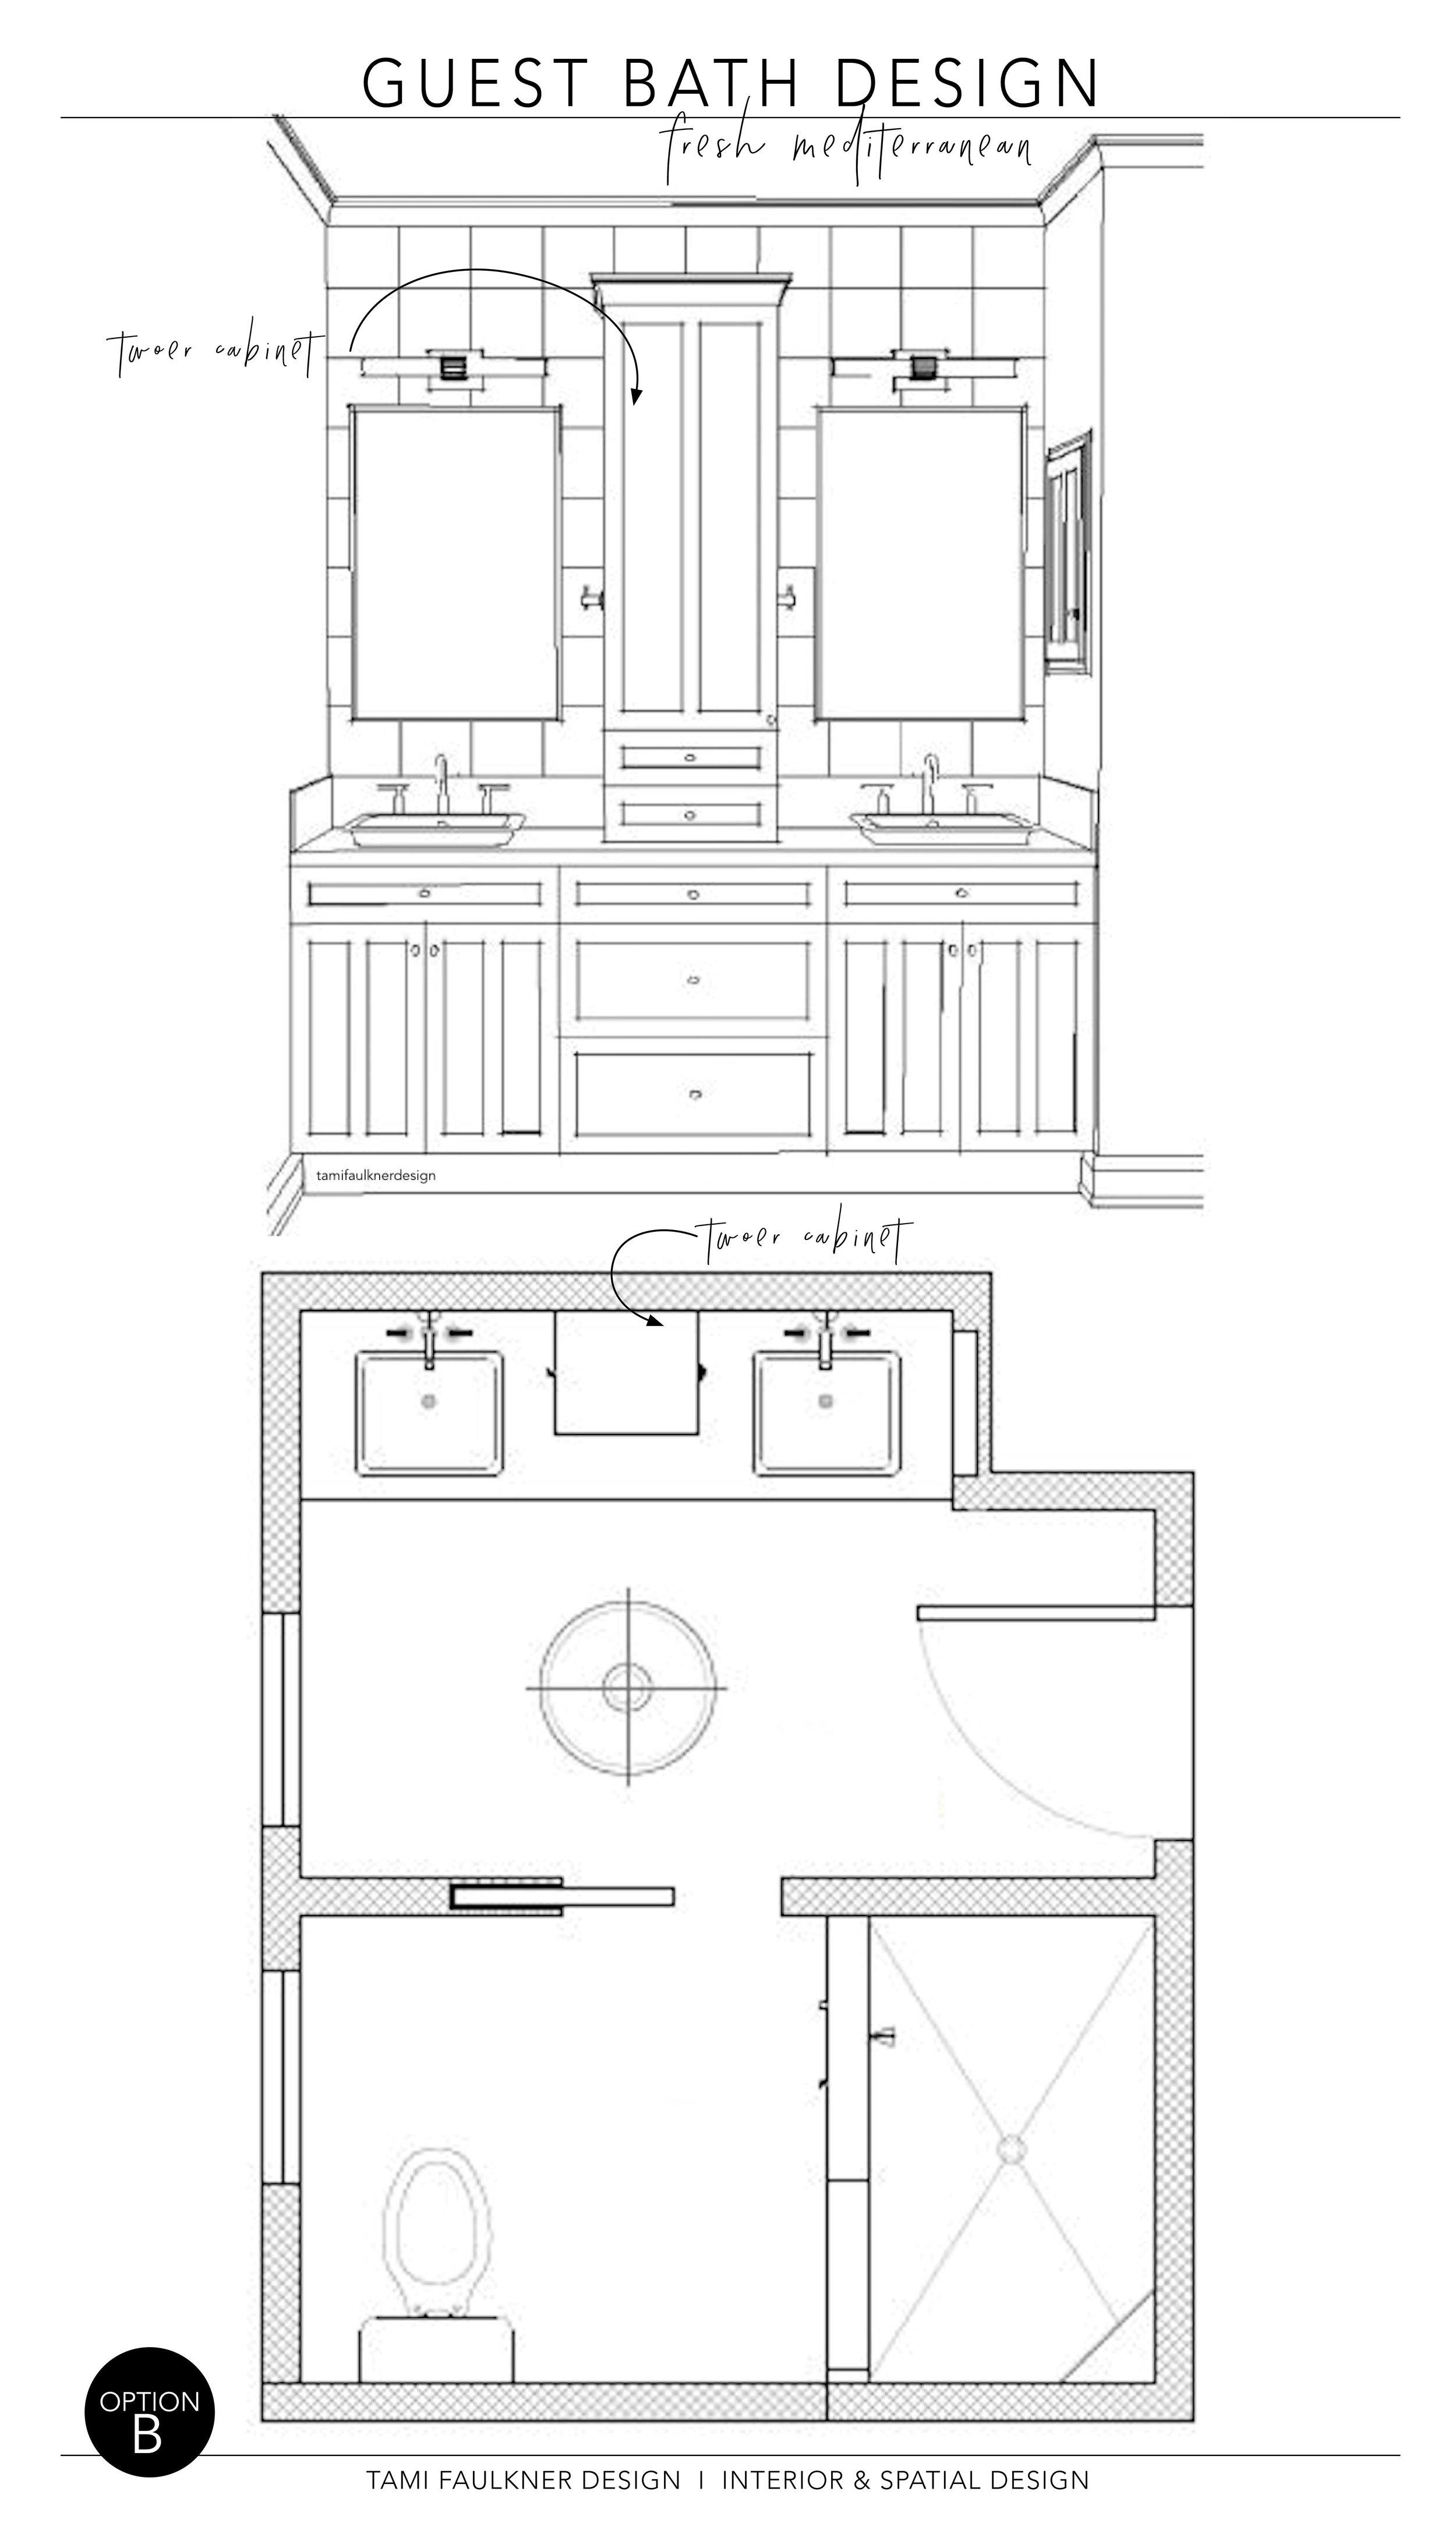 FEATURE WALL + FLOOR PLAN - OPTION B